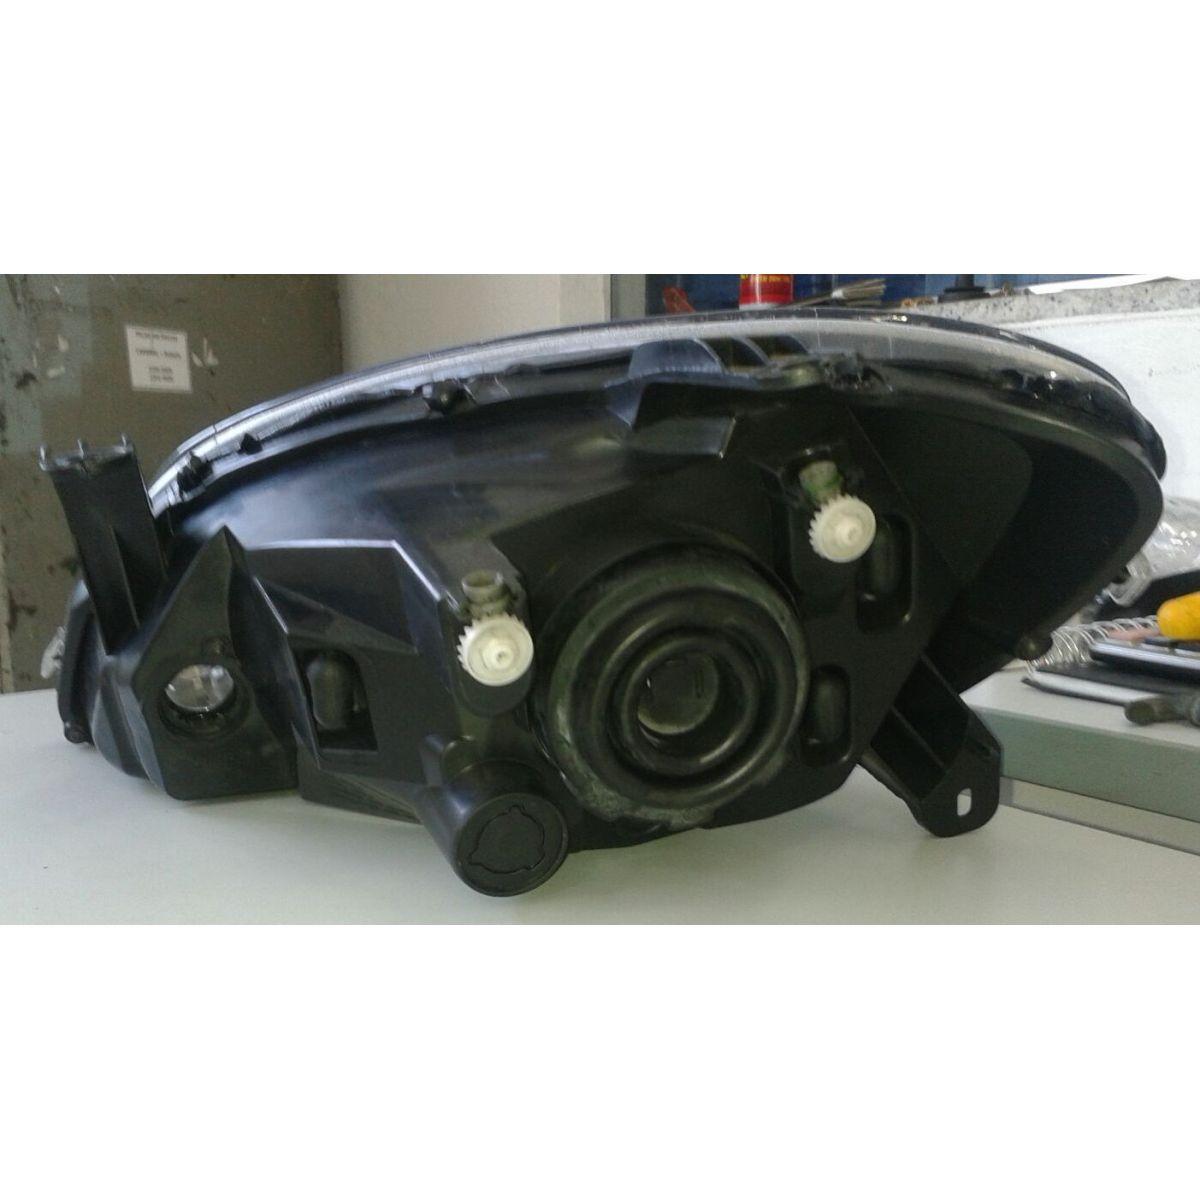 Farol Celta Dark Chrome 10 a 12  - Amd Auto Peças